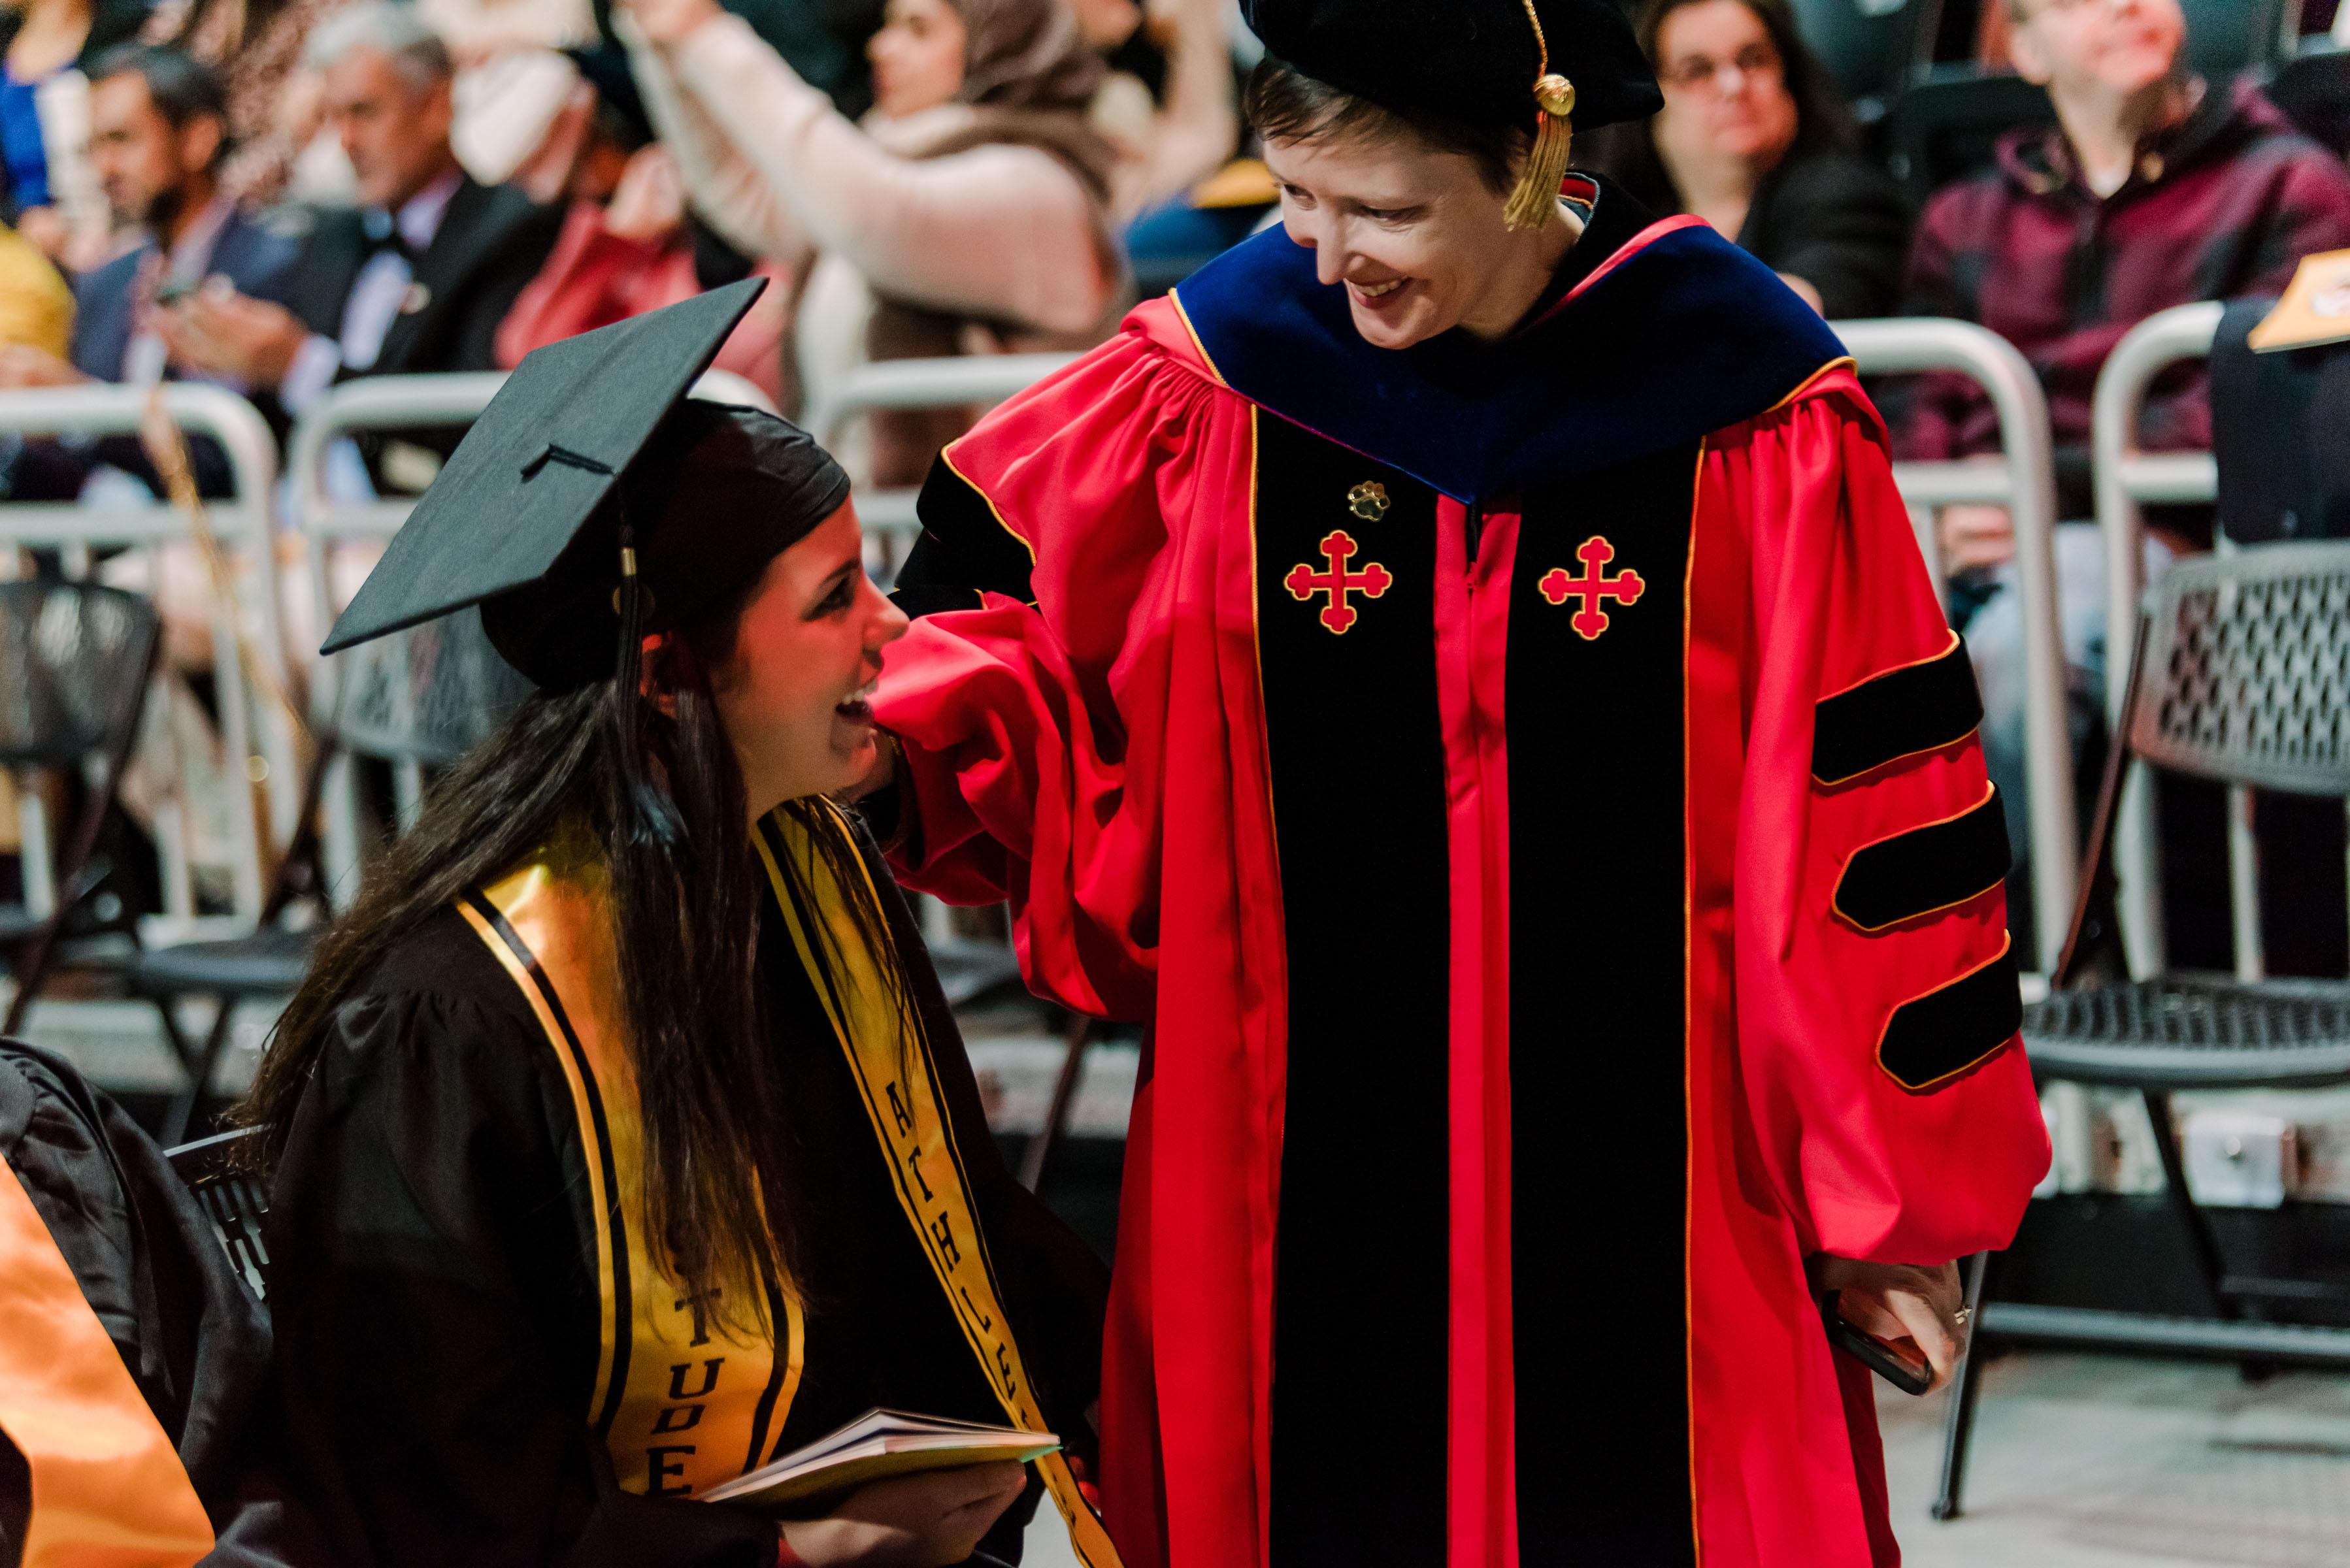 professor and student interact at graduation